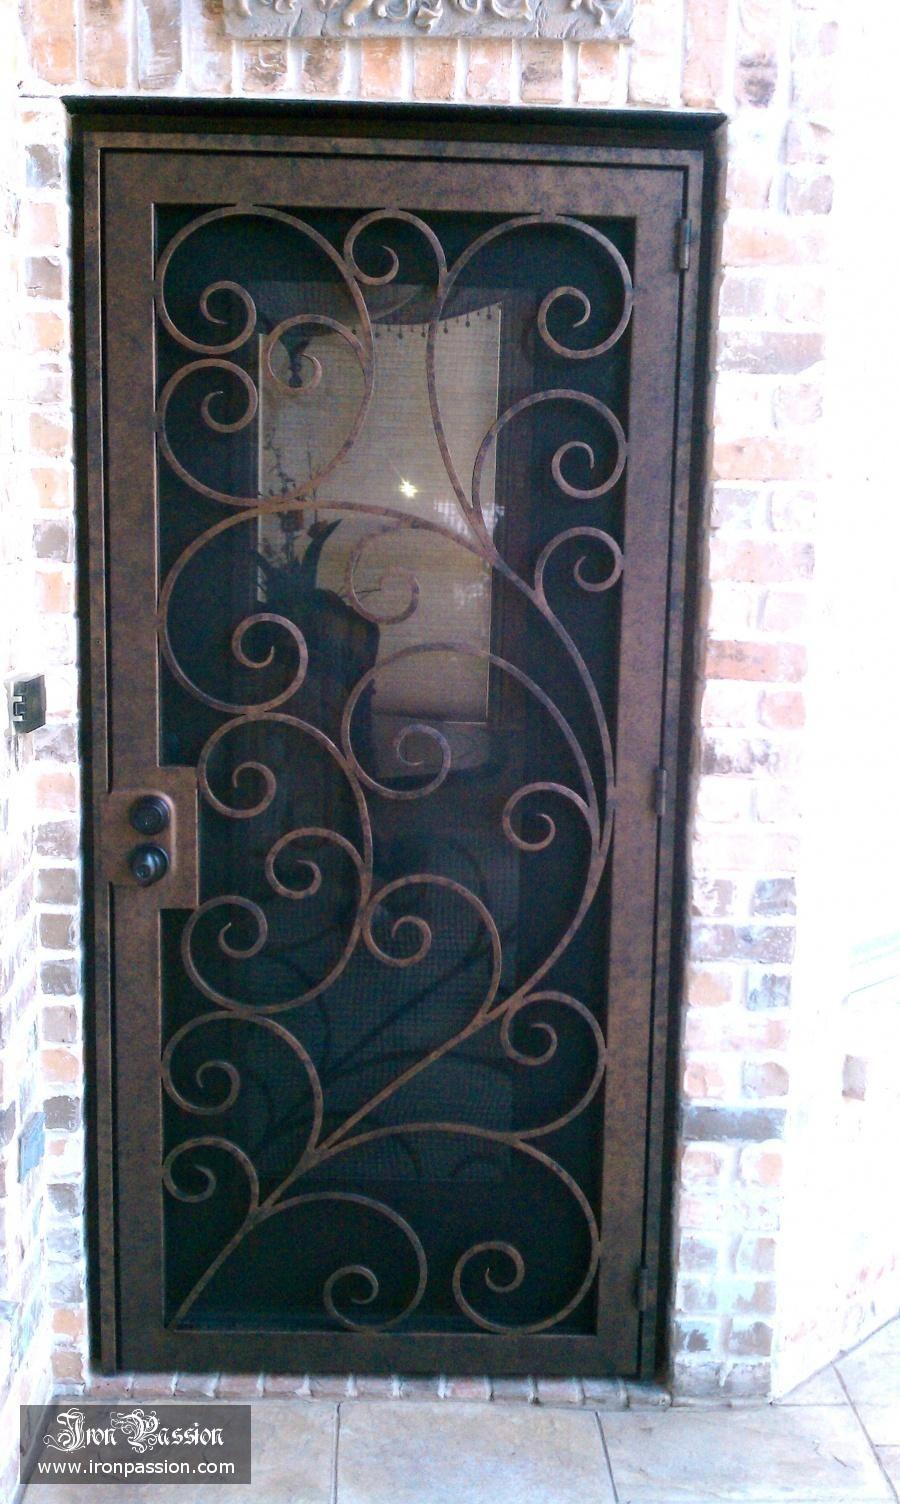 Cascade iron front door beautiful wrought iron door with grille iron passions wrought iron security screen door ip sd 004 rubansaba